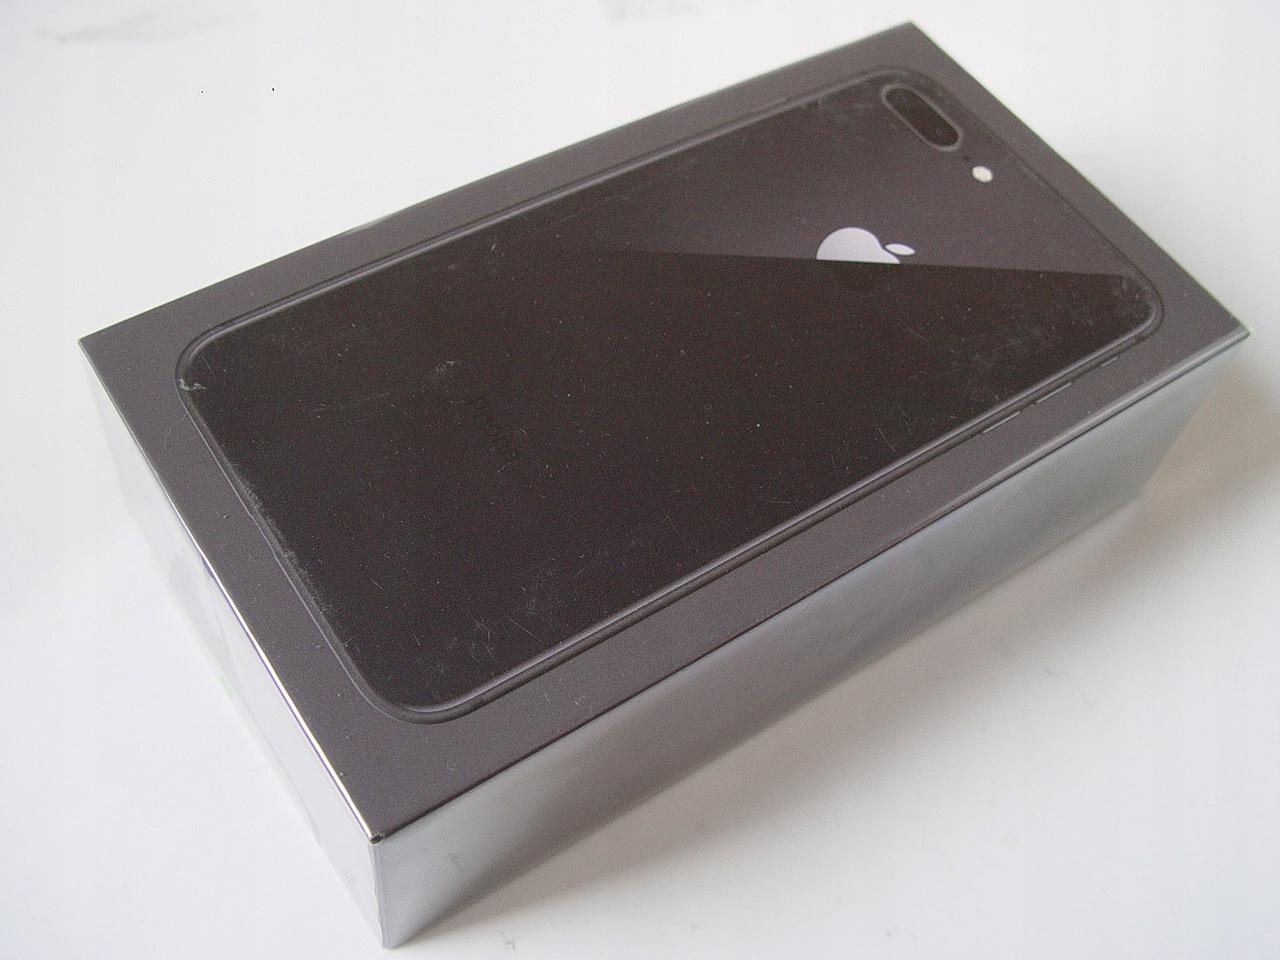 PL Apple IPHONE 8 Plus 64GB Gray GWAR sklep KRK